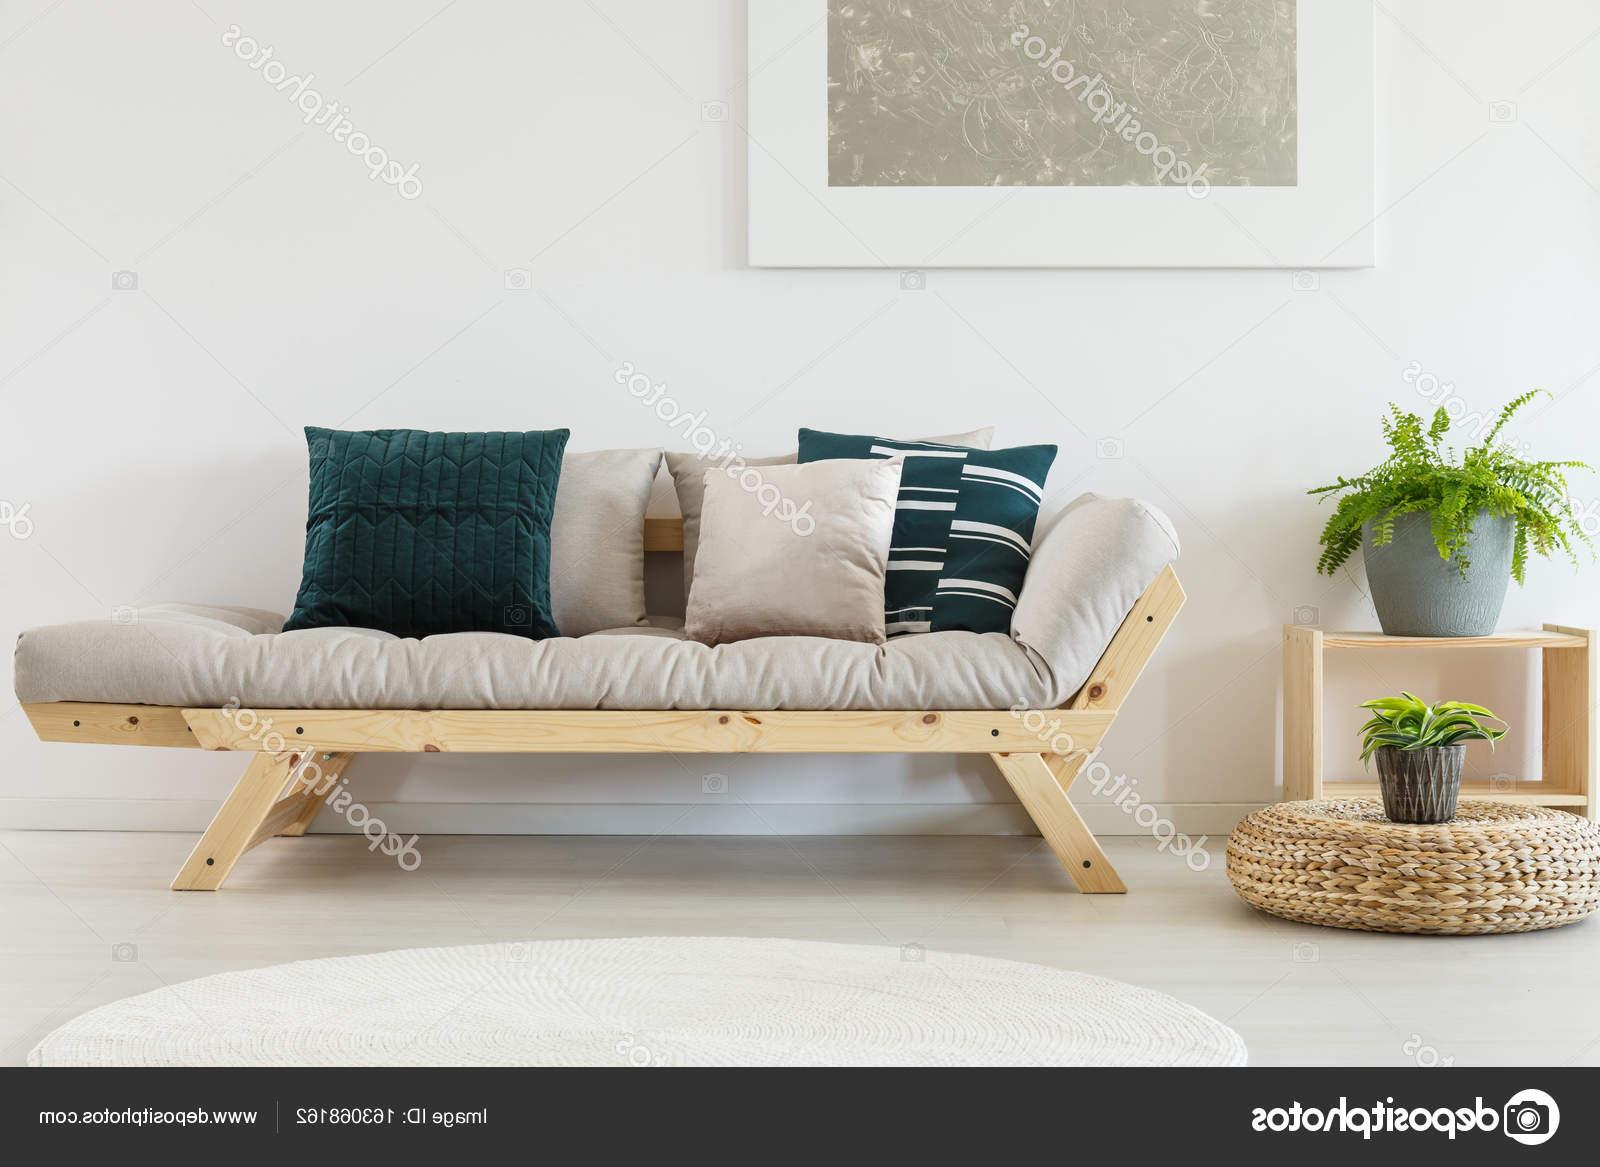 Cojines Para sofa Beige J7do sofà Beige Con Cojines Azules Foto De Stock Photographee